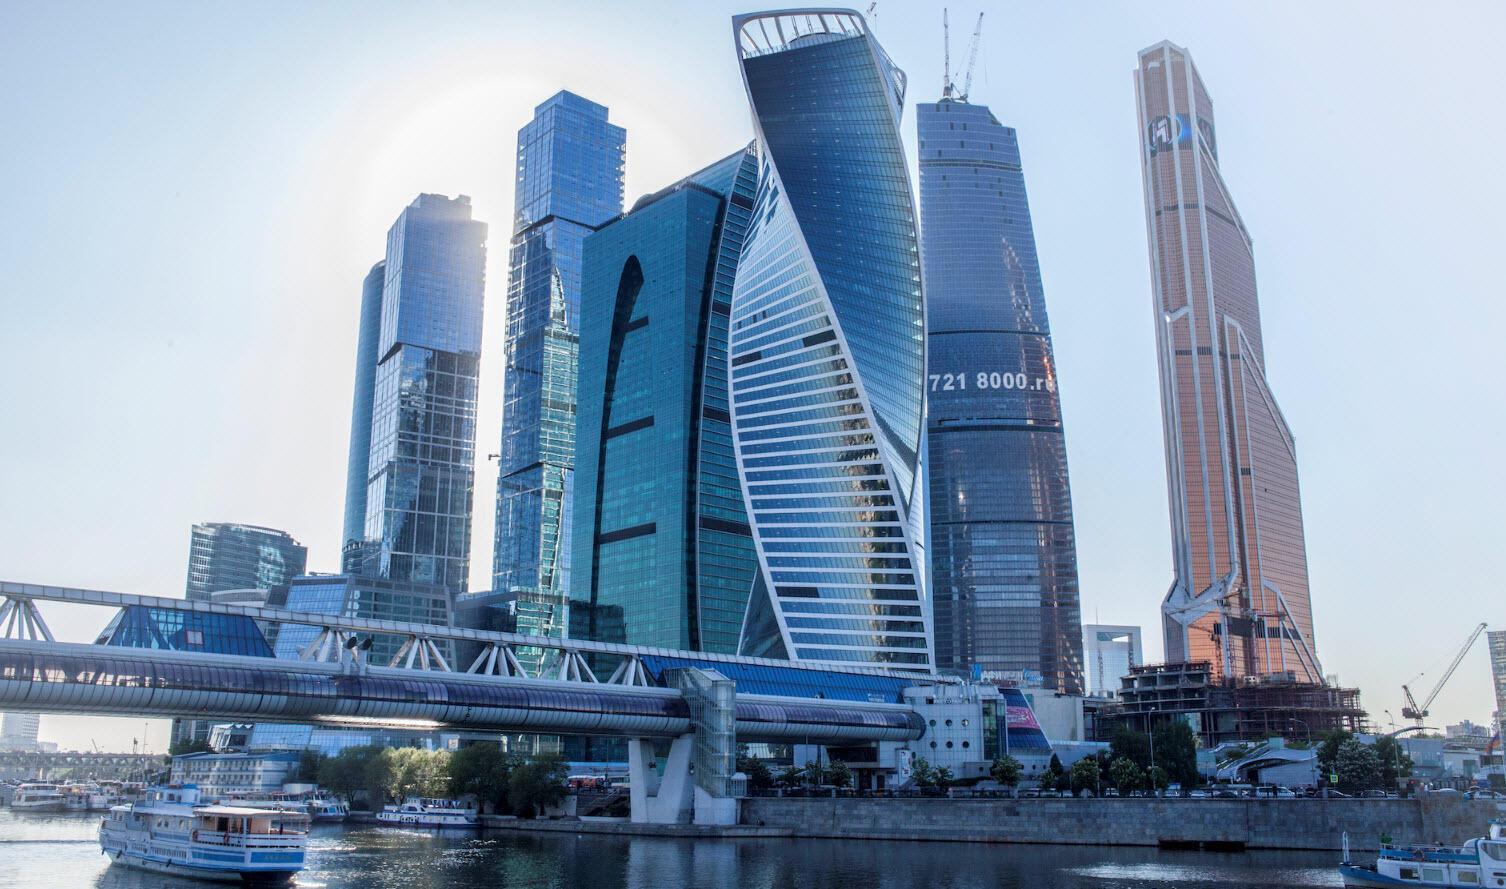 Moskovada İsviçre bankası